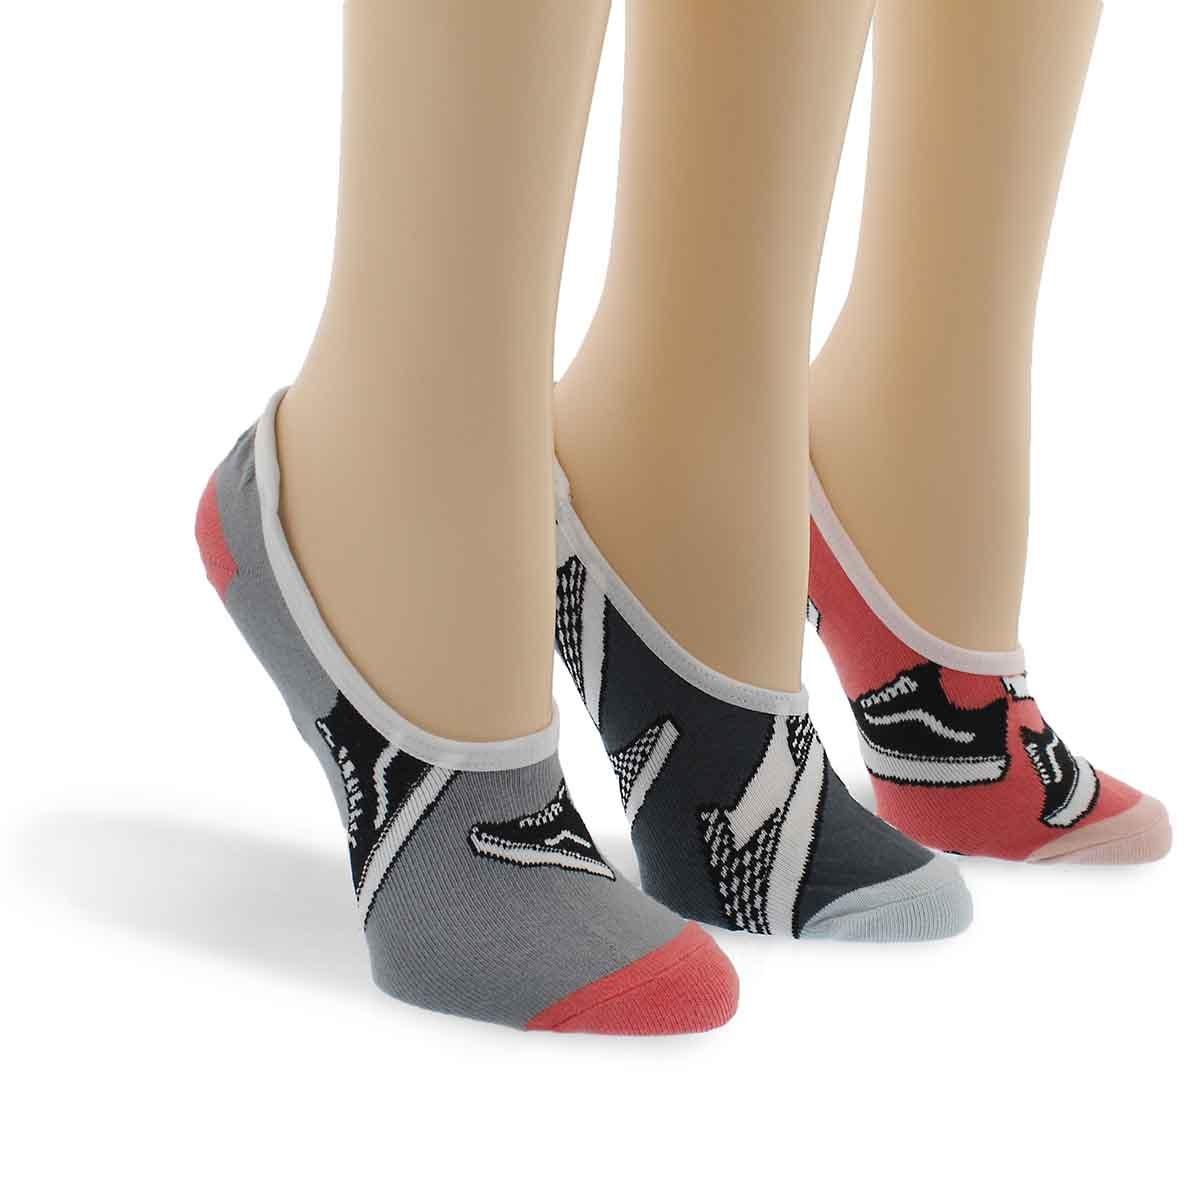 Lds Basic Canoodle assort. ankle sock 3p